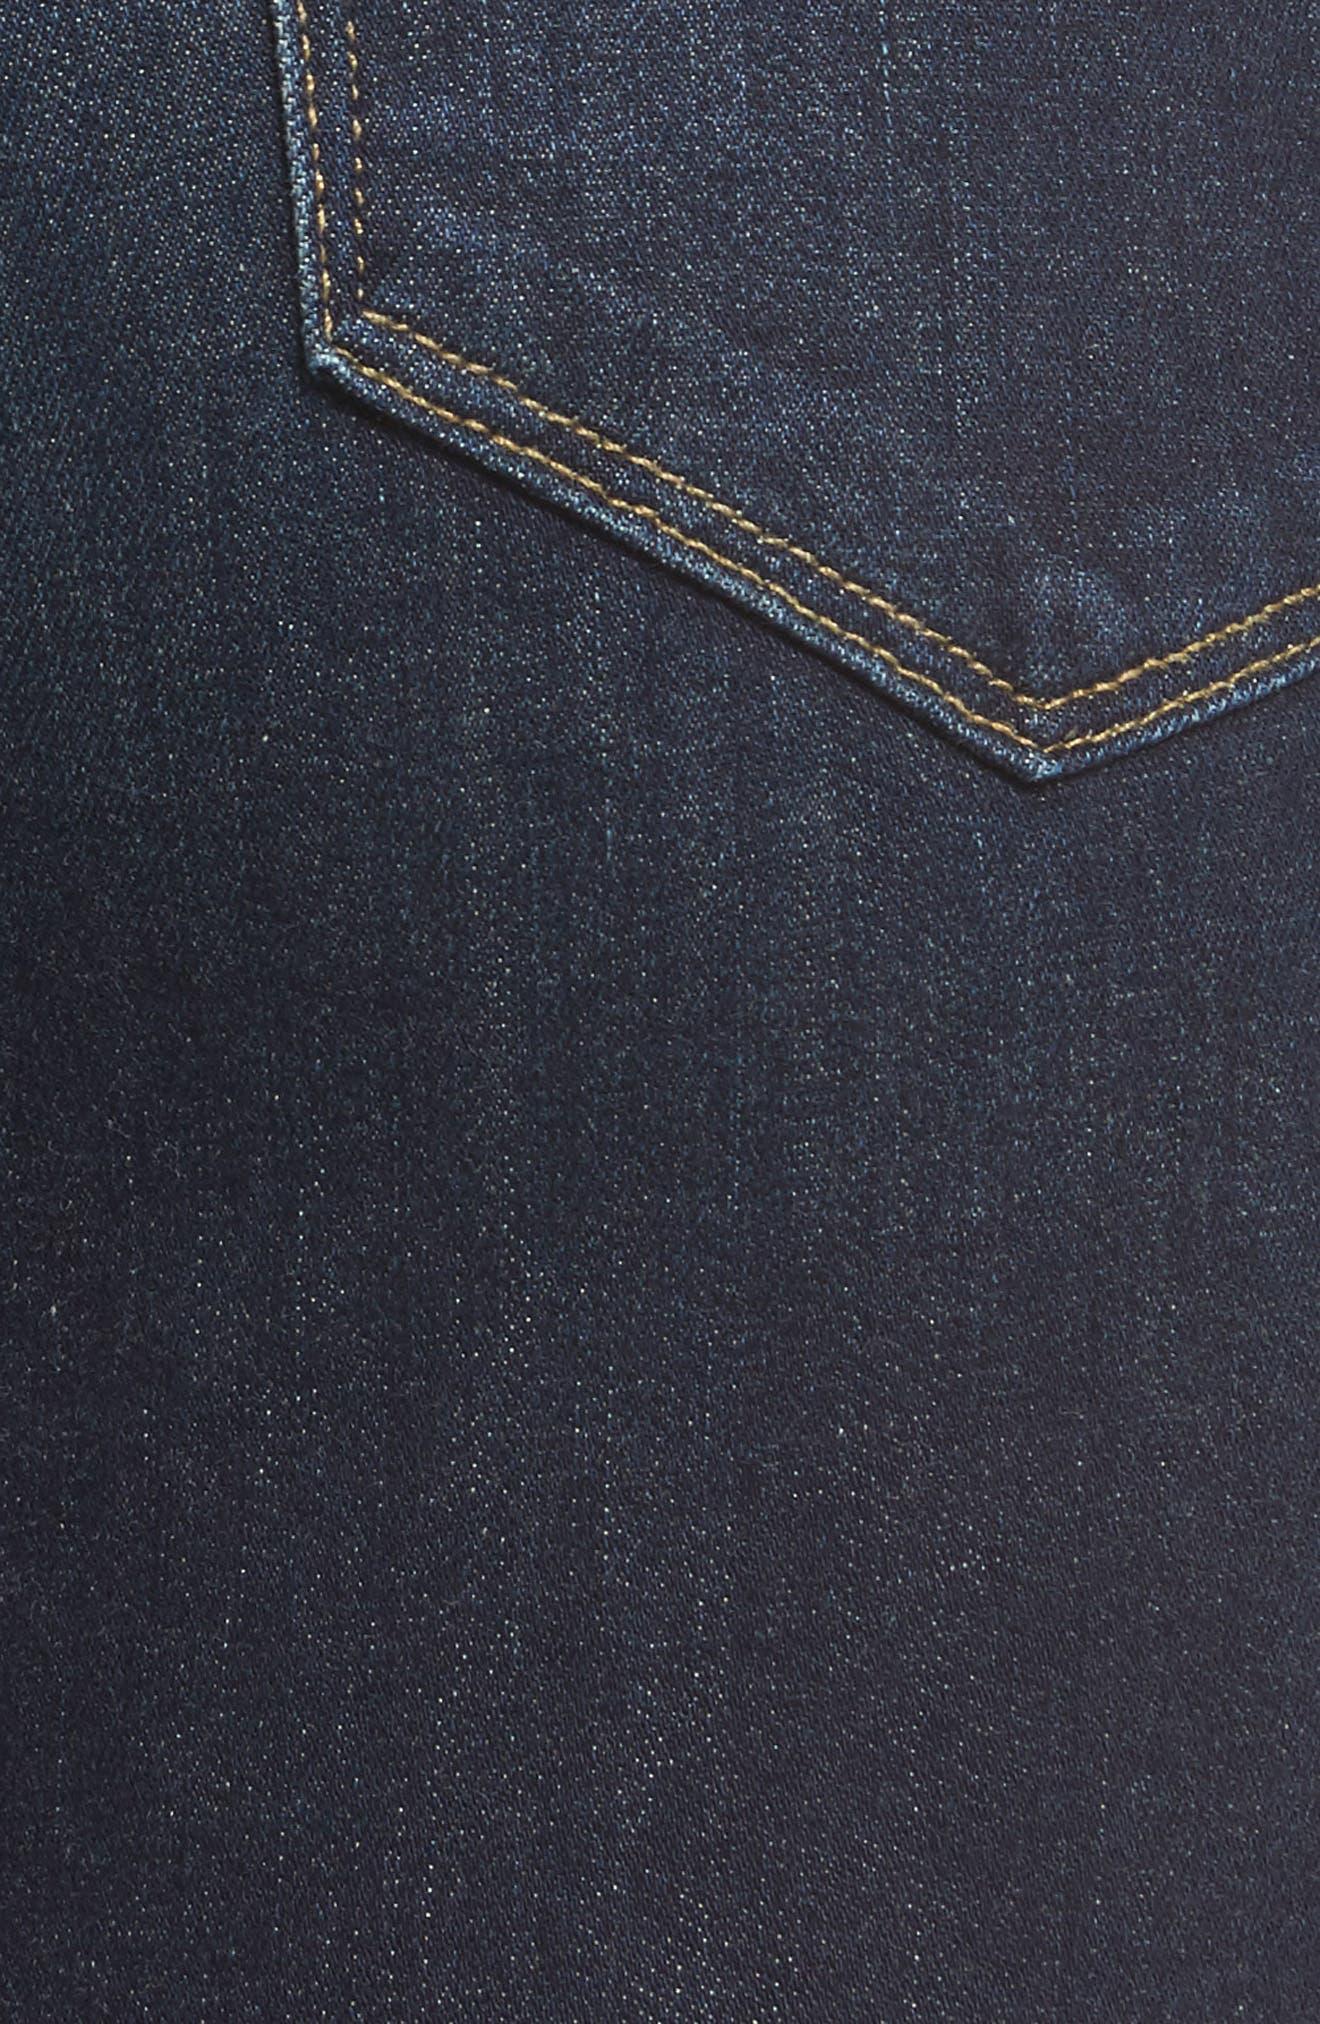 Hoxton Crop High Waist Skinny Jeans,                             Alternate thumbnail 5, color,                             400